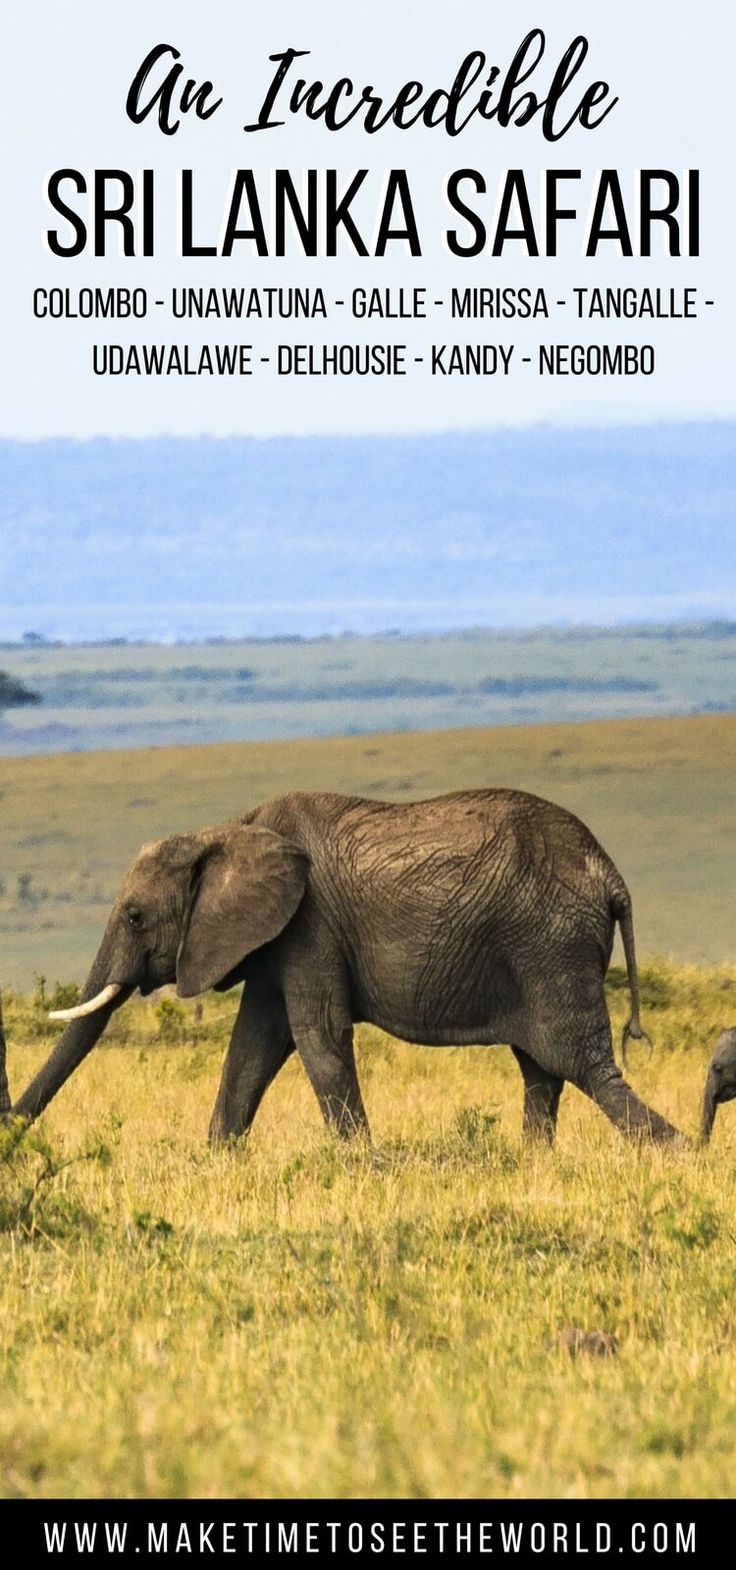 [REVIEW] Take in Sri Lanka's highlights on the Trails Asia Sri Lanka Safari - an ethical, small group adventure tour for active travelers. #SriLanka #SriLankaSafari #Colombo #Negombo #Mirissa #Kandy #AdamsPeak Sri Lanka Itinerary   Sri Lanka Travel   Kandy   Mirissa   Colombo   Negombo